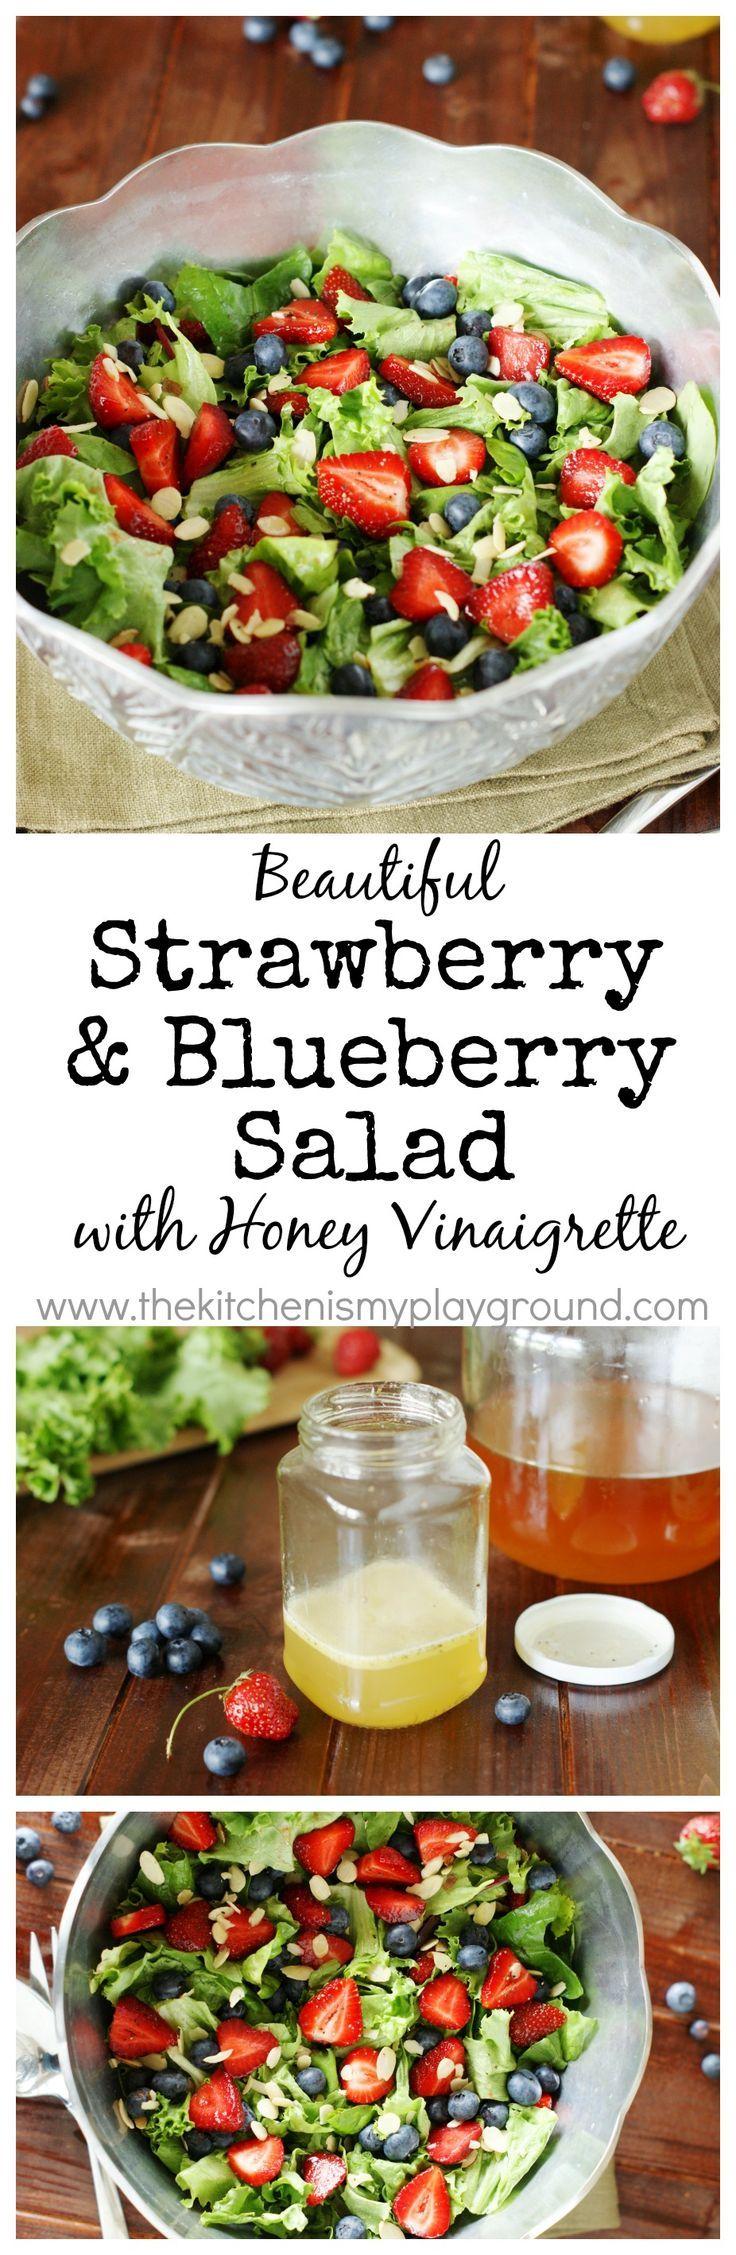 ... salads on Pinterest | Kale caesar salad, Greek yogurt dressing and